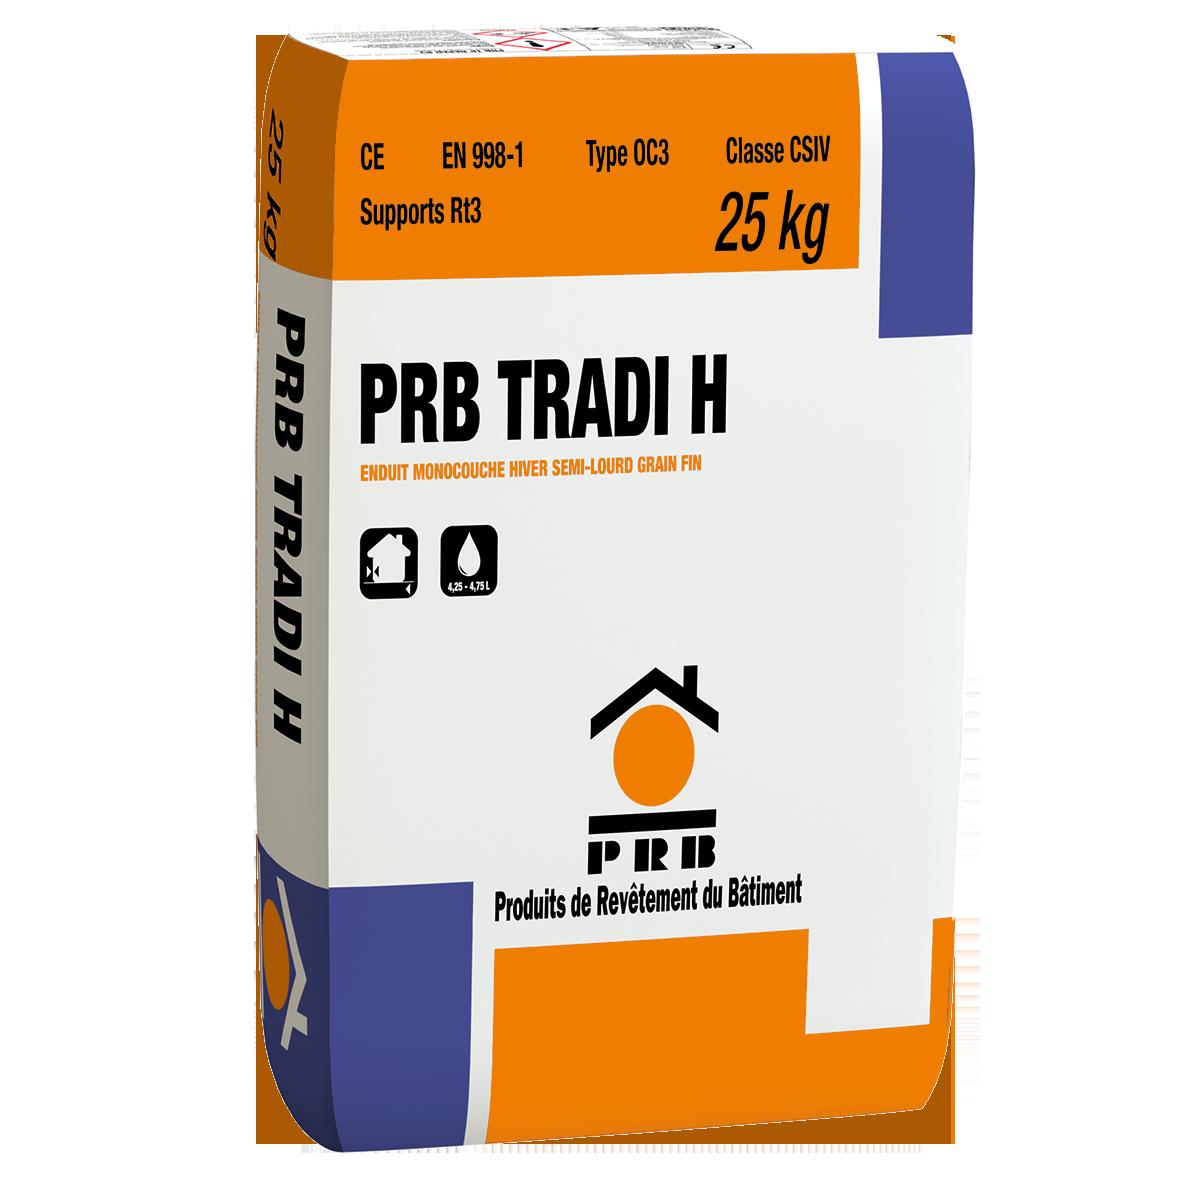 PRB TRADI H 25 KG